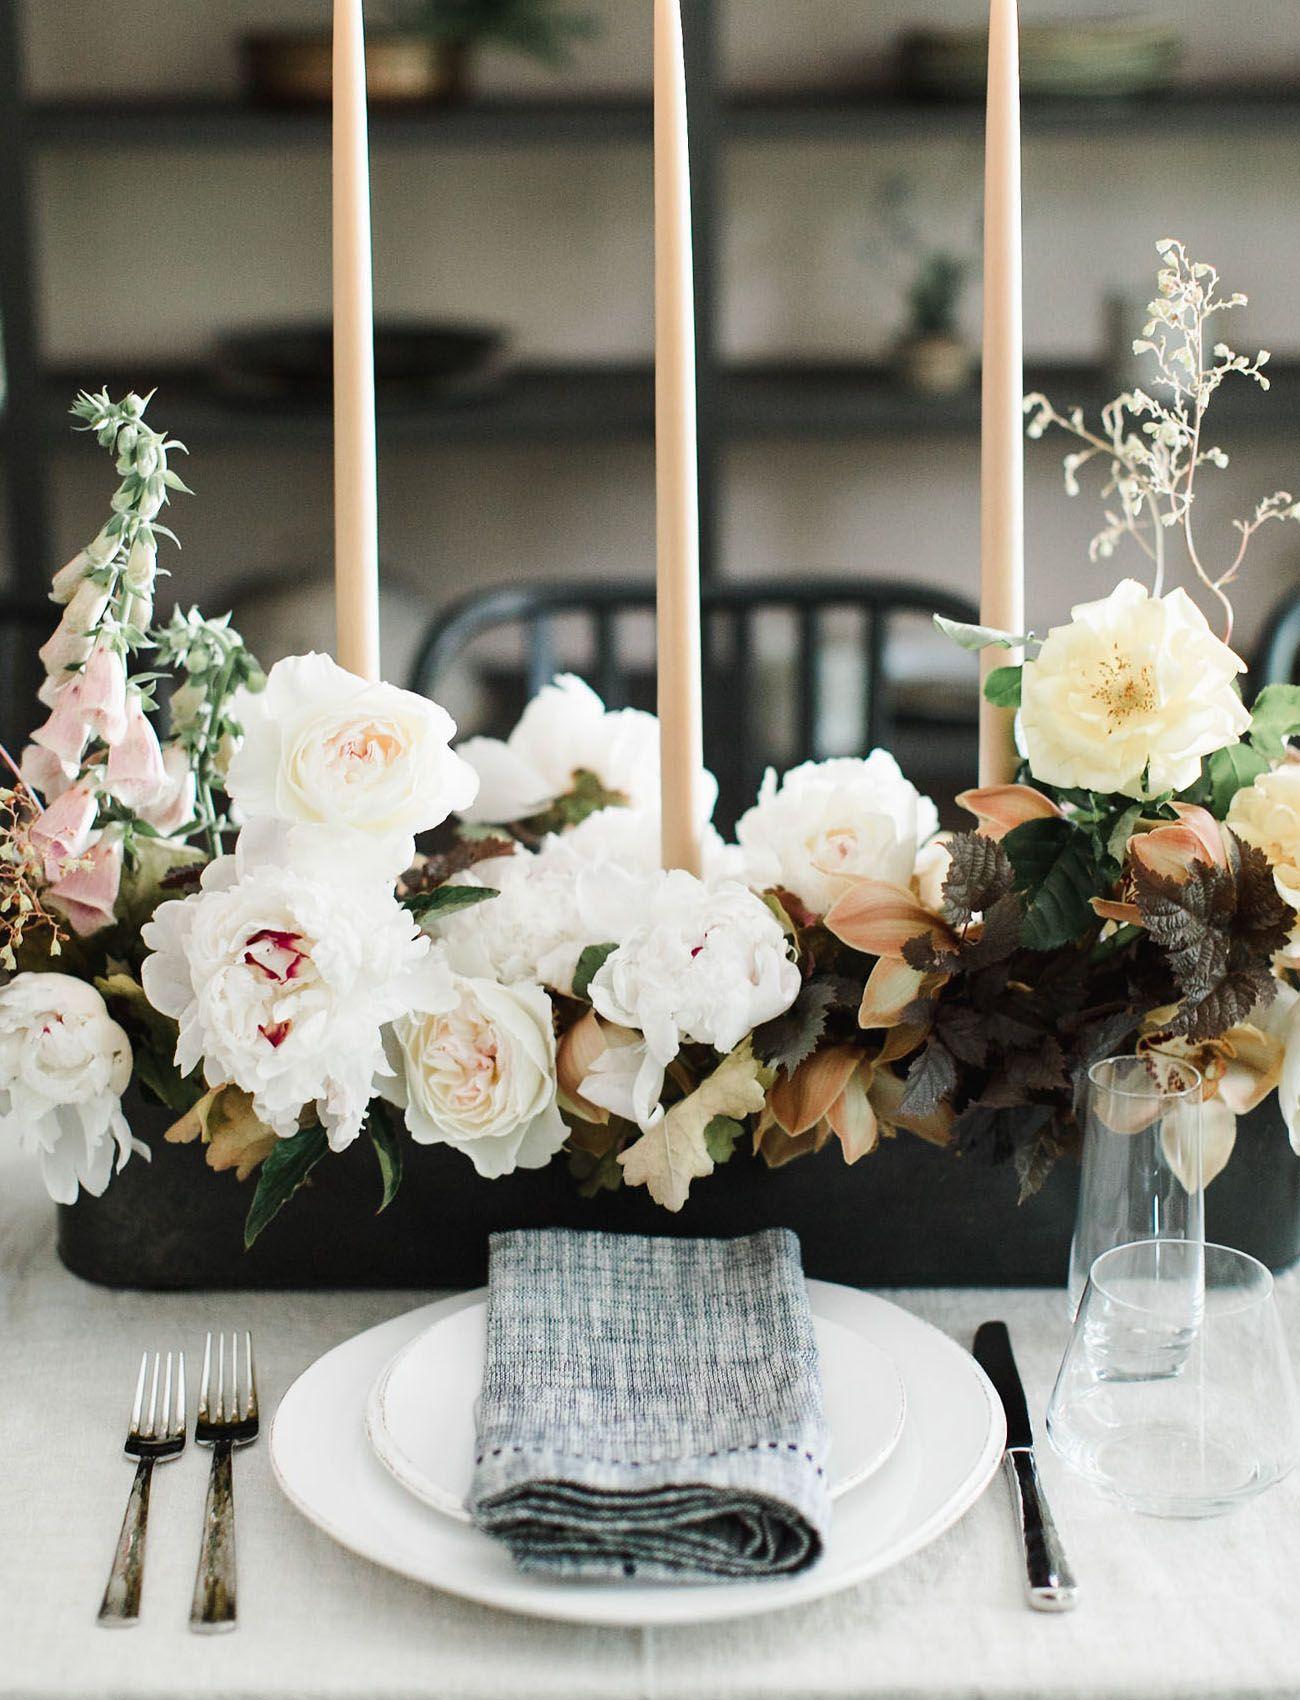 Modern Art: Minimalist Wedding Inspiration at a Catskills Mountain Home - Green Wedding Shoes